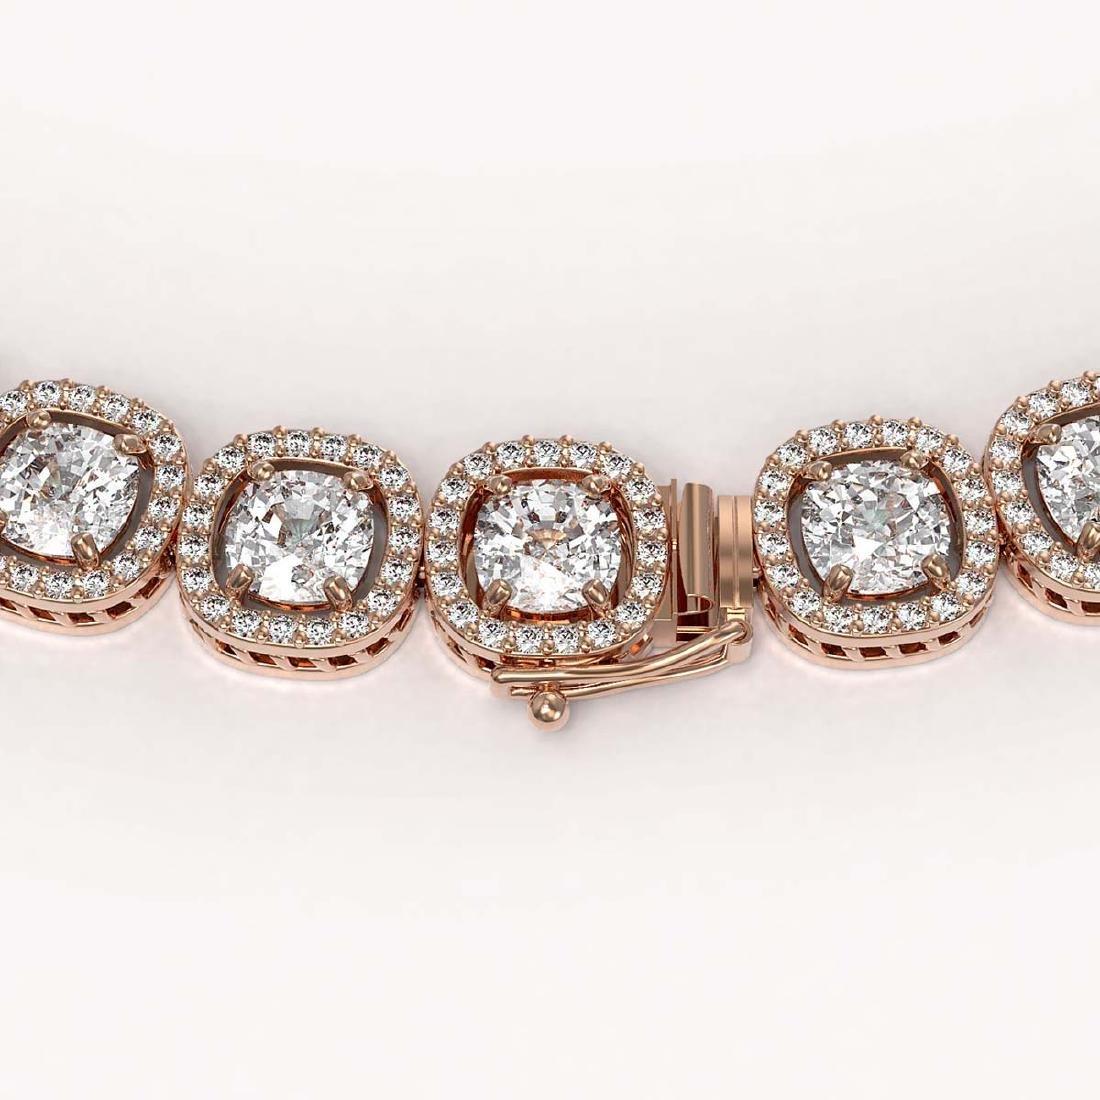 32.64 CTW Cushion Diamond Designer Necklace 18K Rose - 3